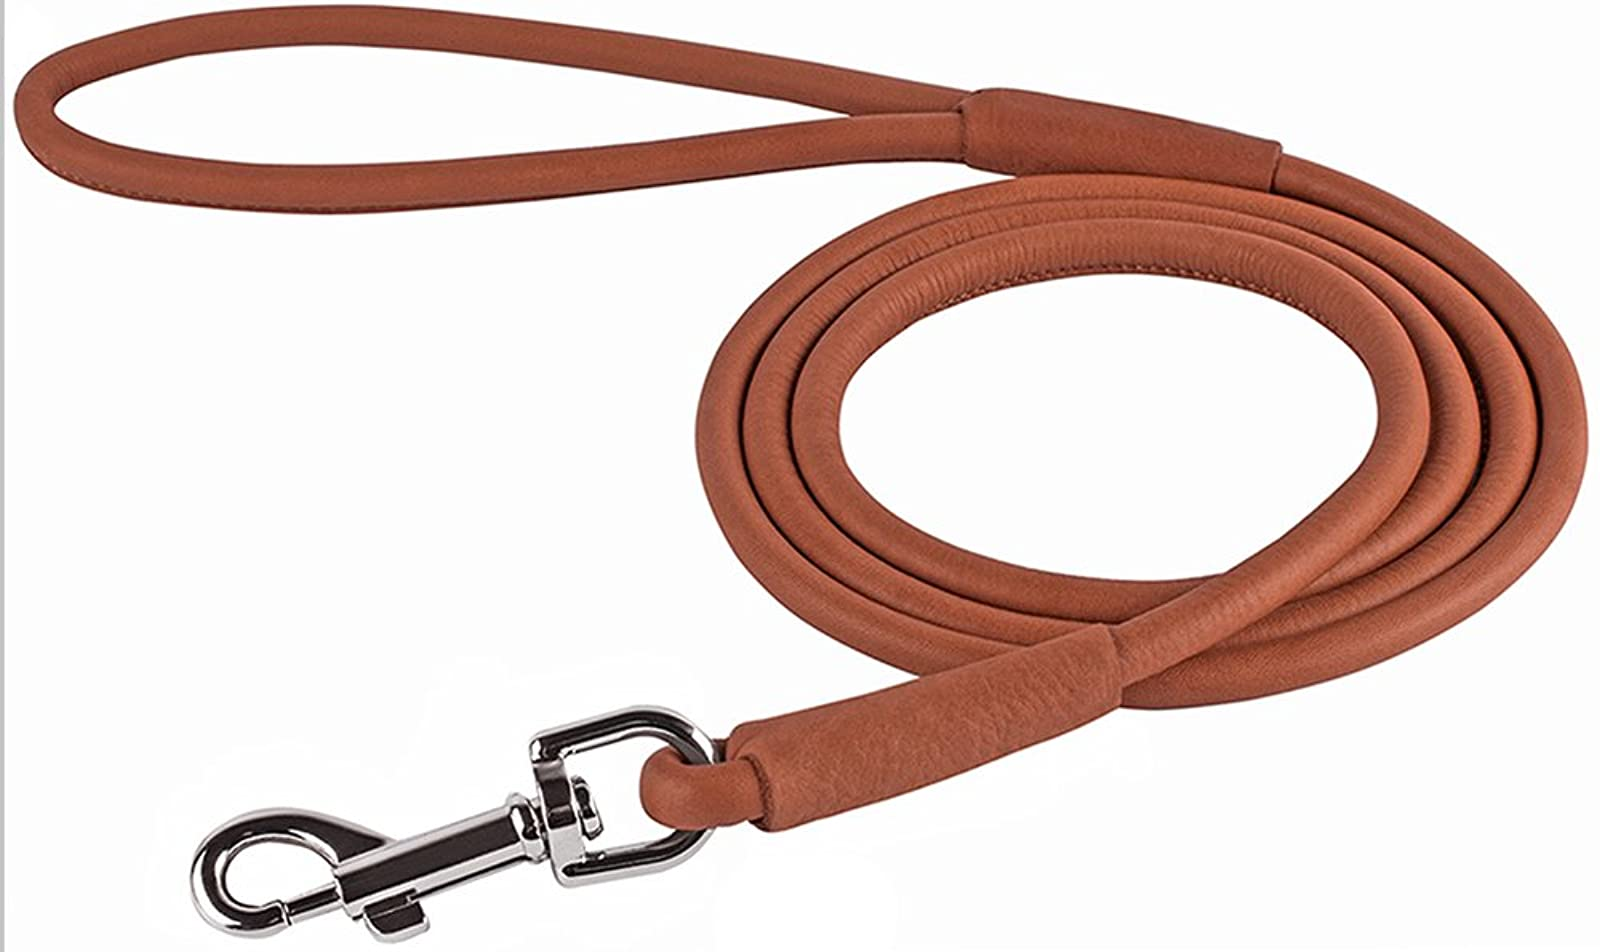 CollarDirect Rolled Leather Dog Leash 4ft Soft - 3